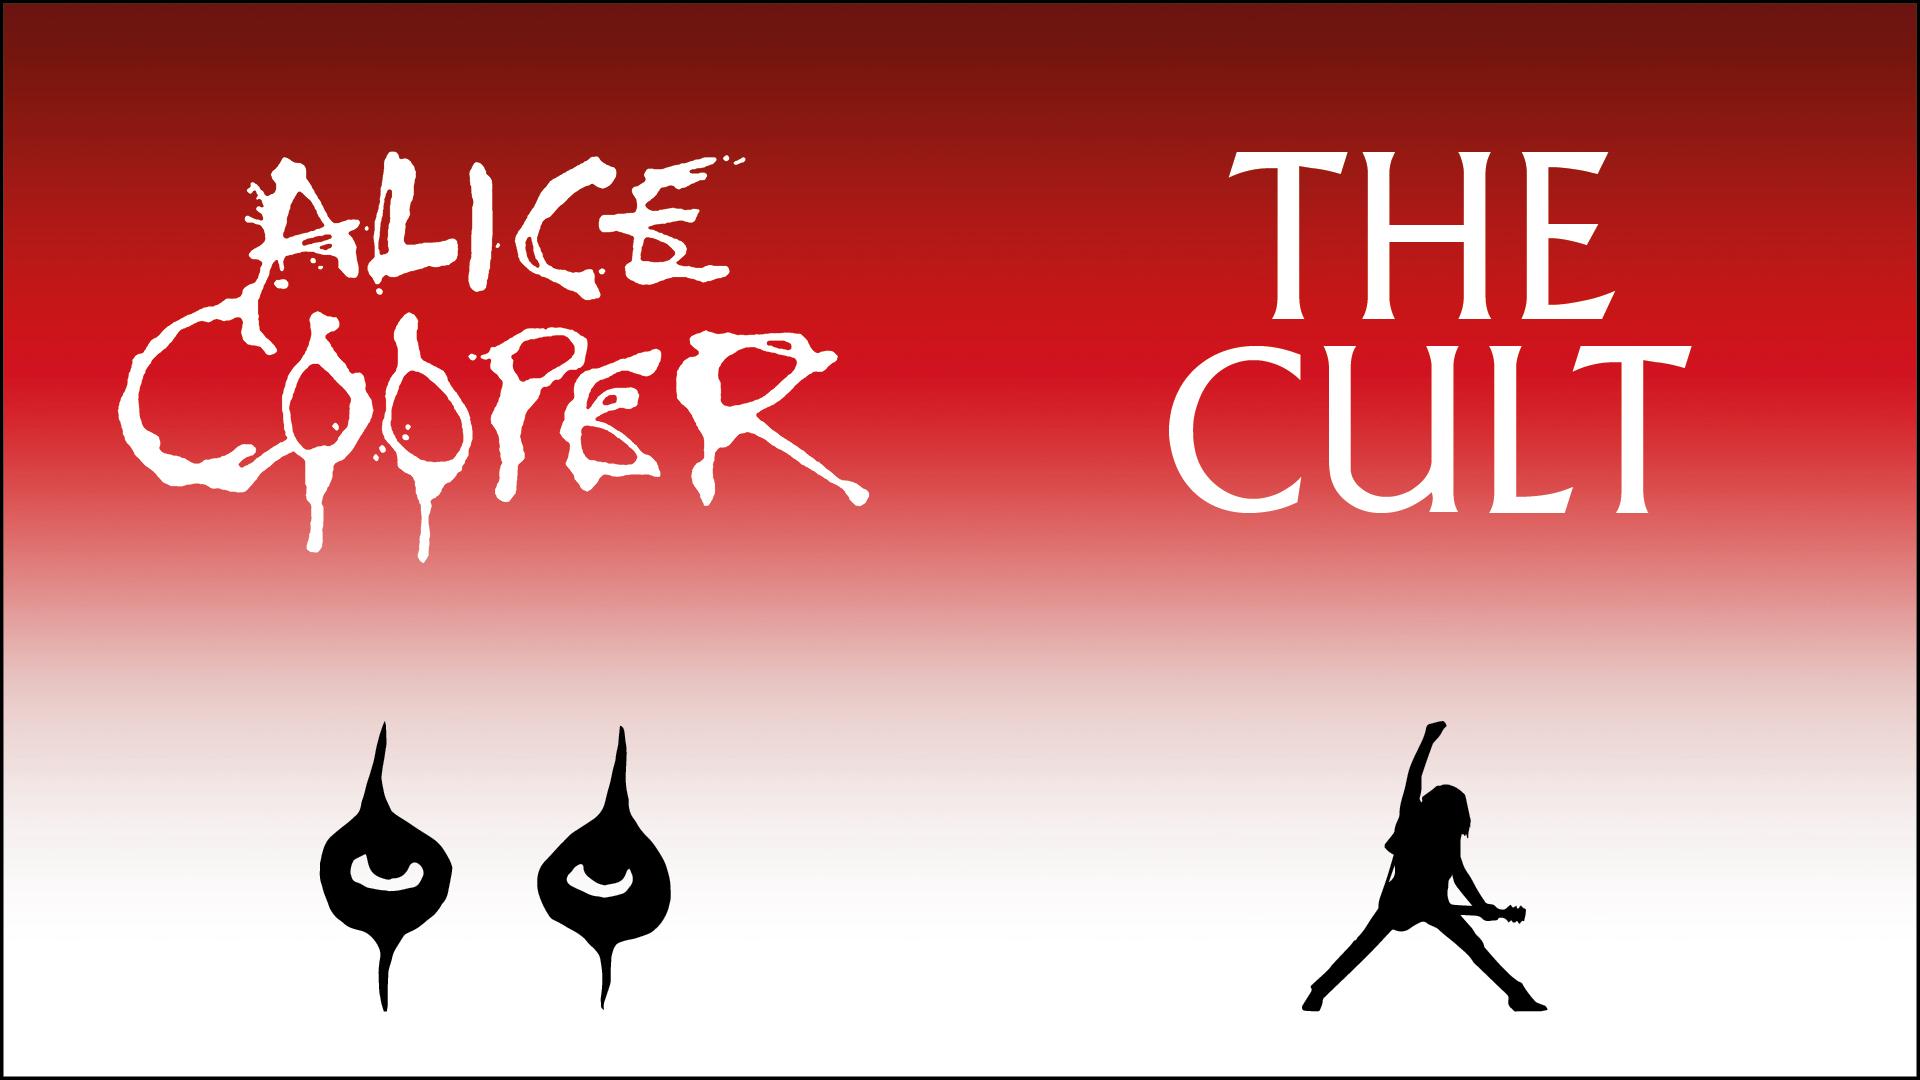 Alice Cooper + The Cult